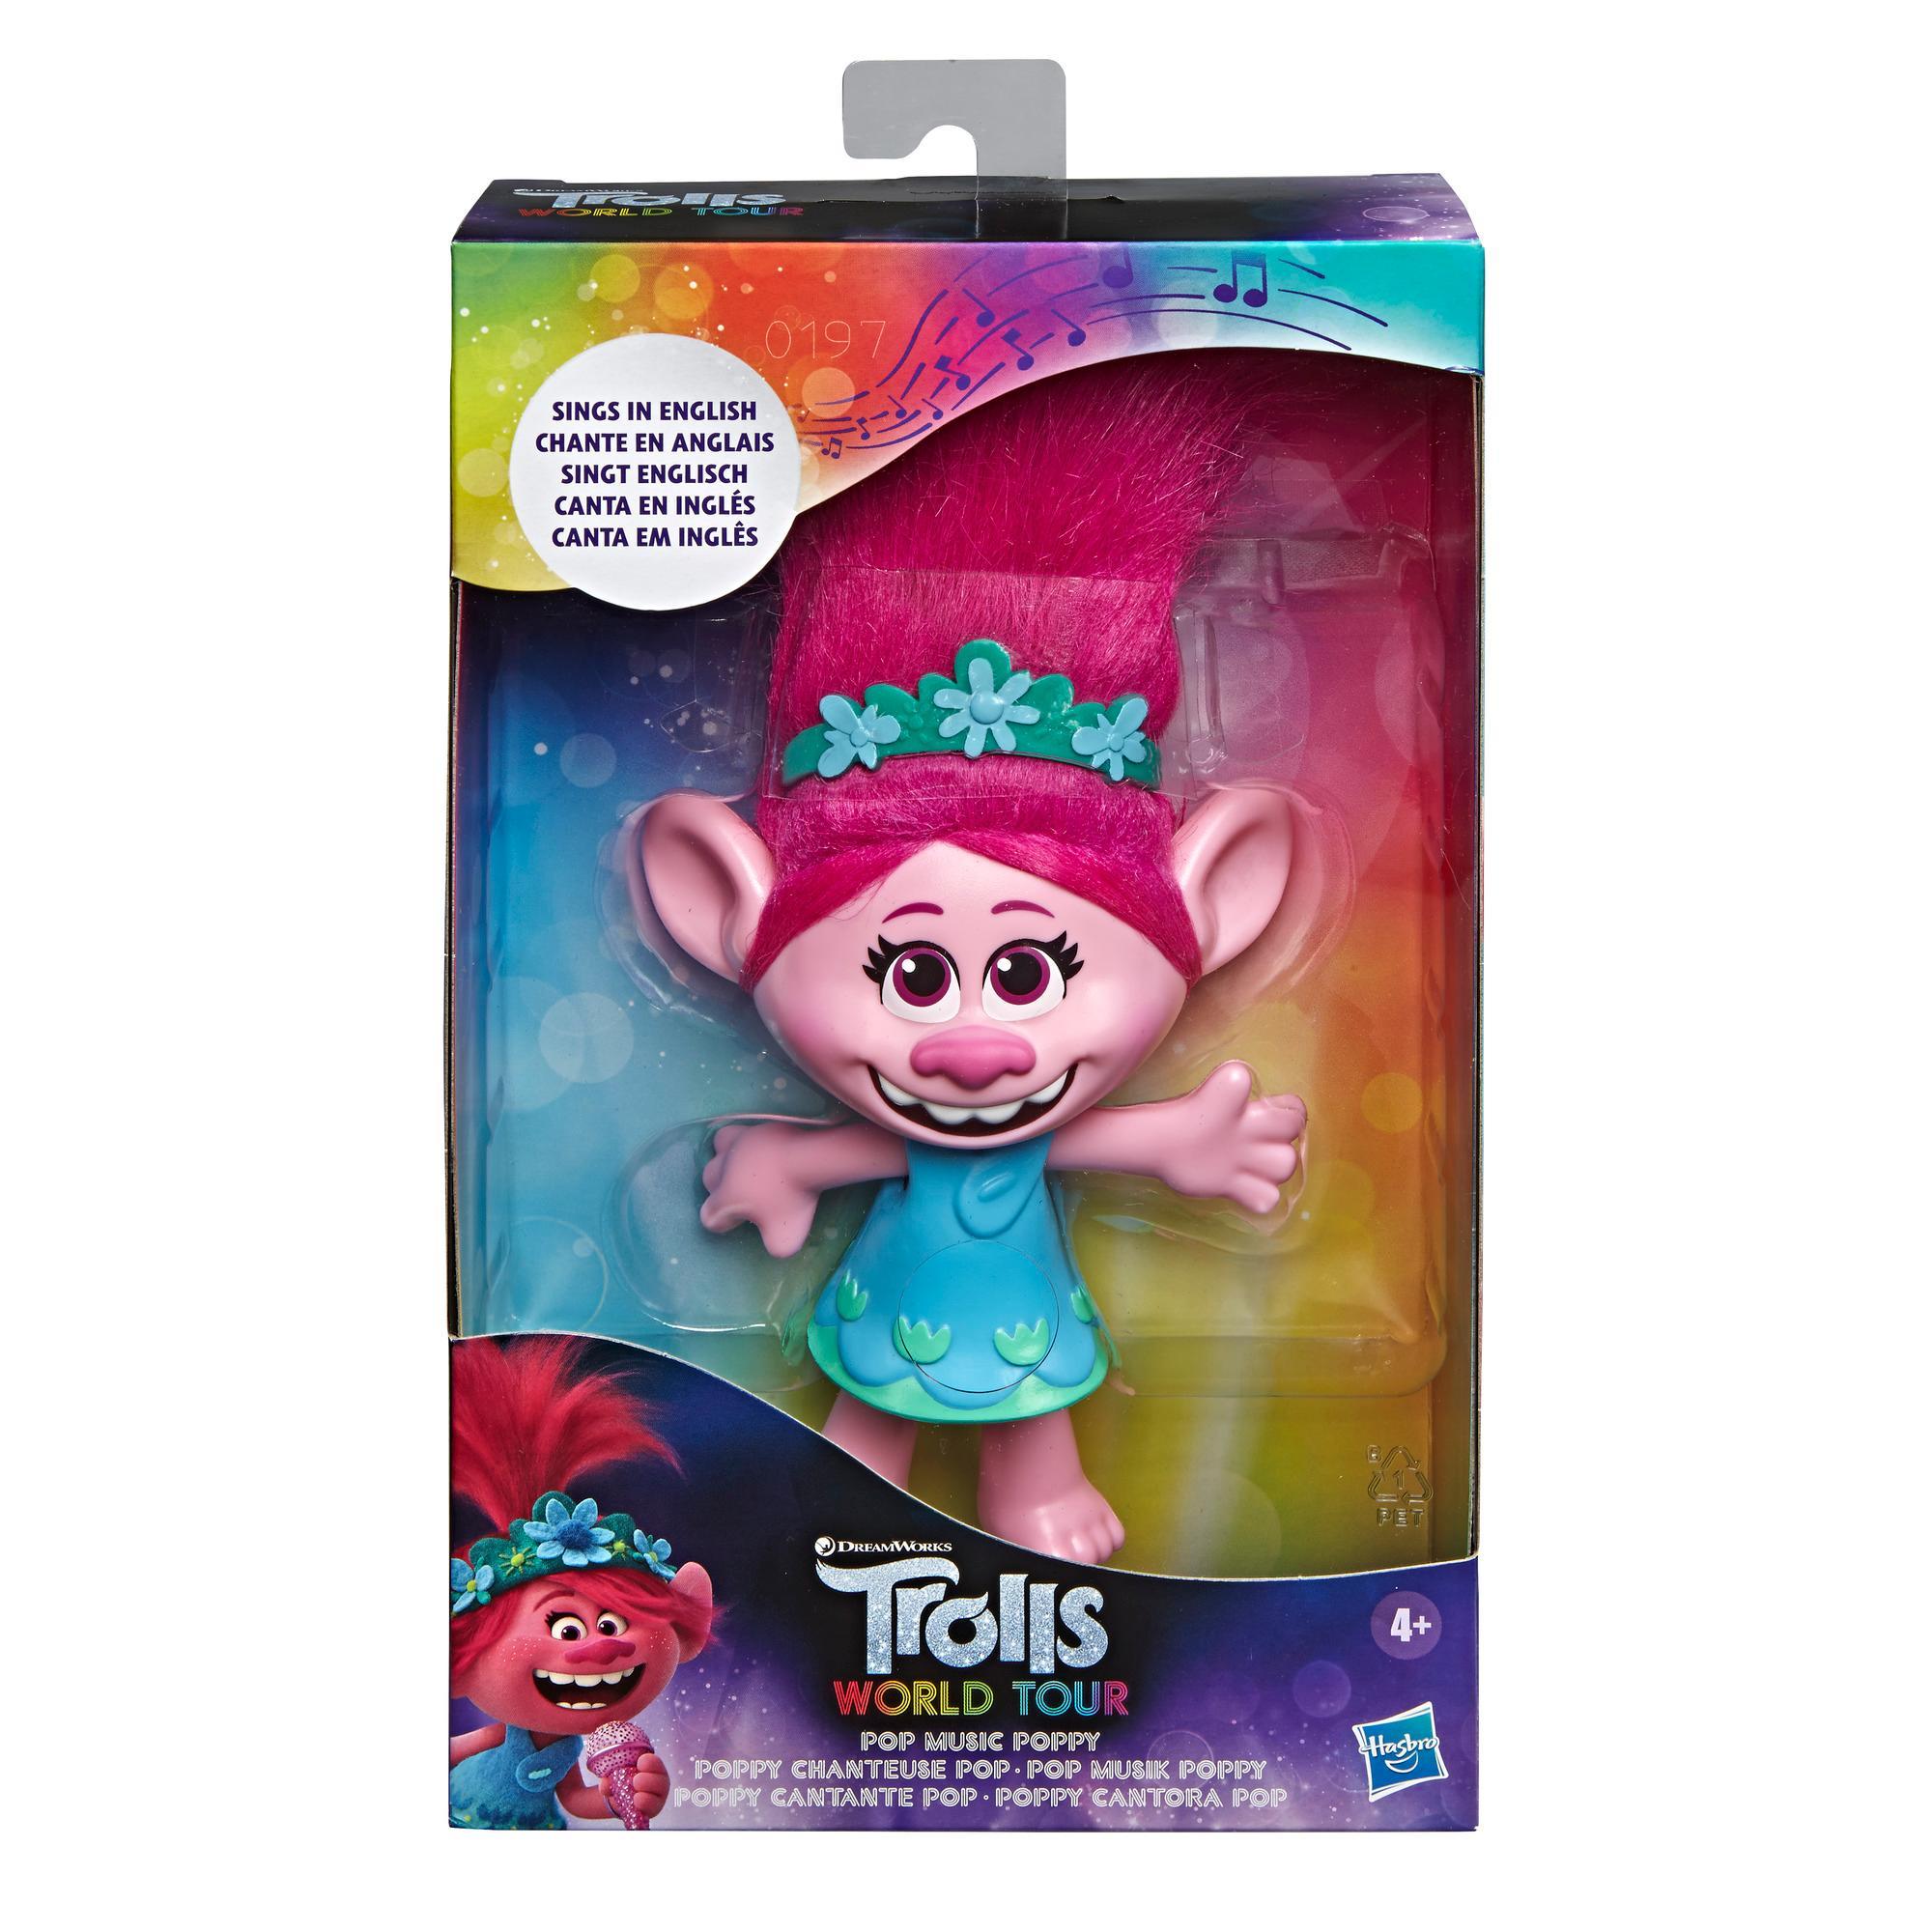 DreamWorks Trolls Pop Music Poppy Singing Doll Toy, Sings Trolls Just Want to Have Fun from DreamWorksTrolls World Tour